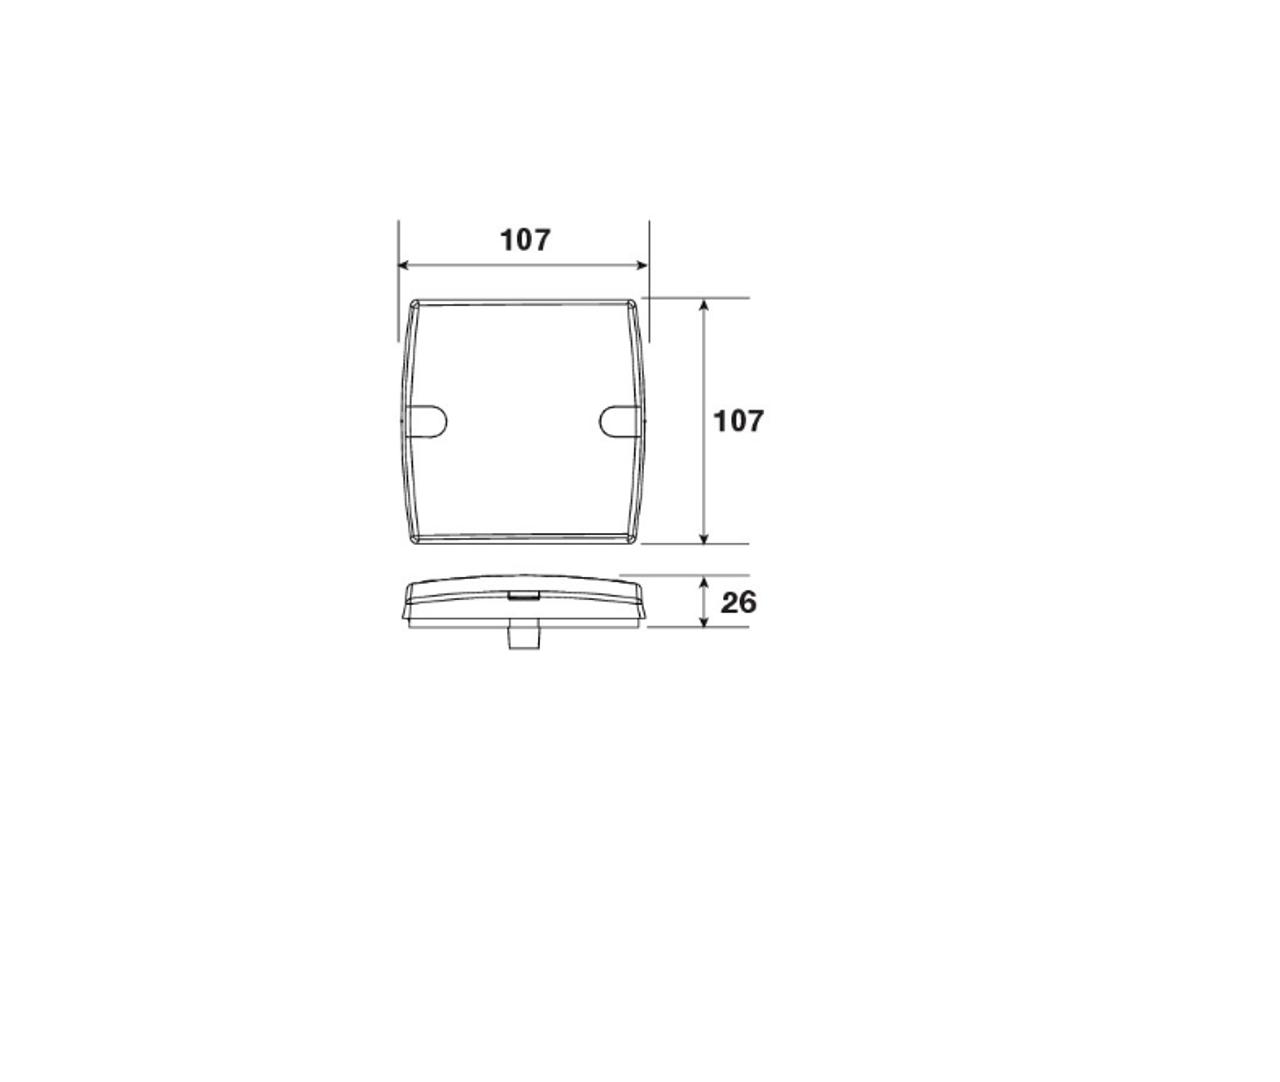 Line Drawing - 93430BL - Narva Model 34 LED Combination Stop Tail Indicator Light 12V Twin Pack. Narva. CD. Ultimate LED.